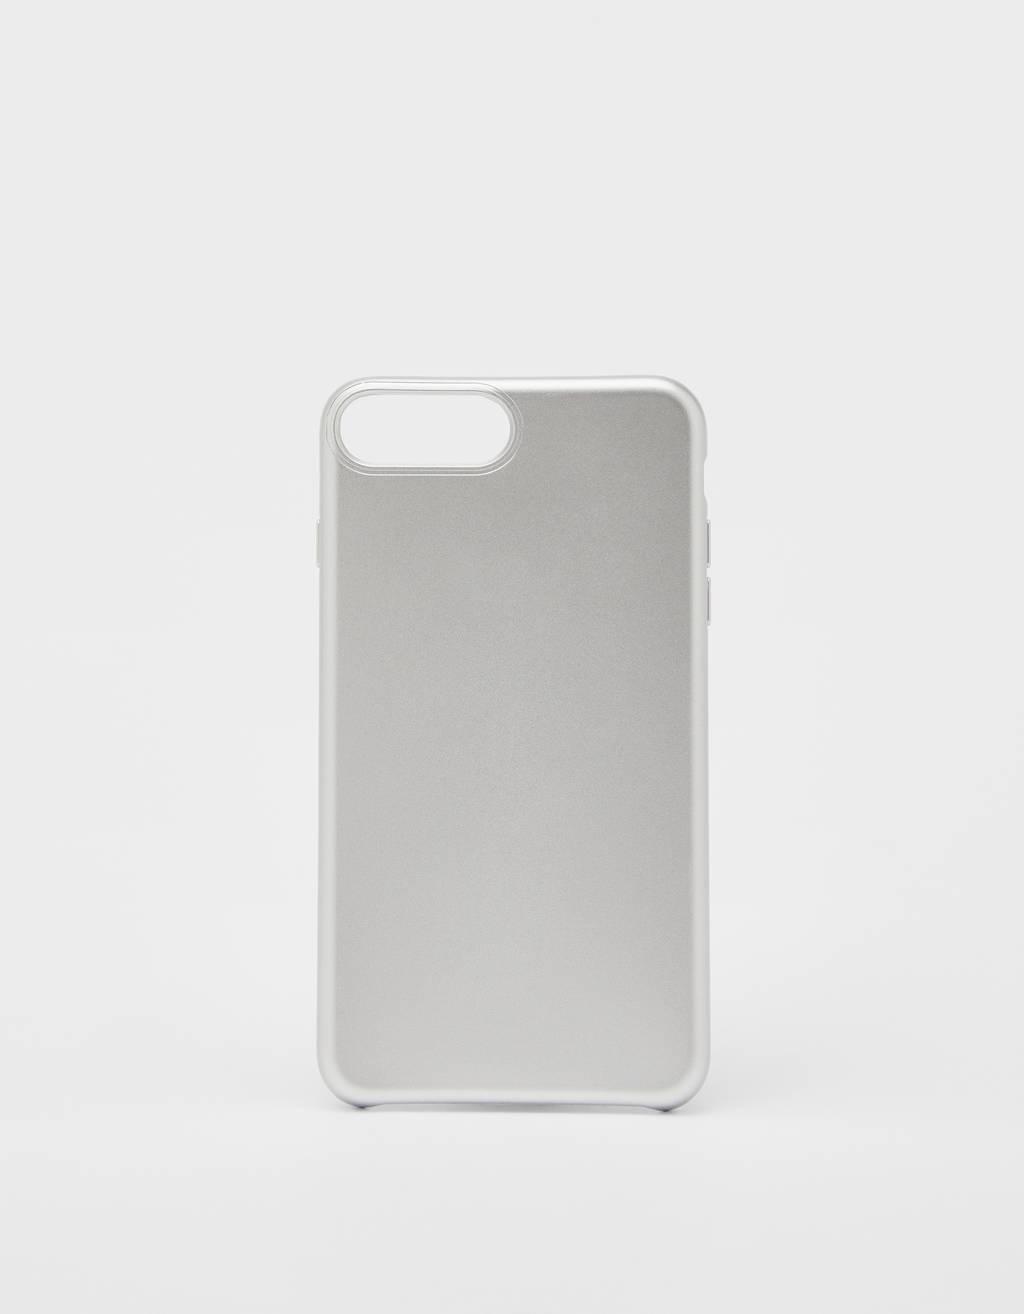 Unifarbene Handyhülle für iPhone 6 plus / 7 plus / 8 plus